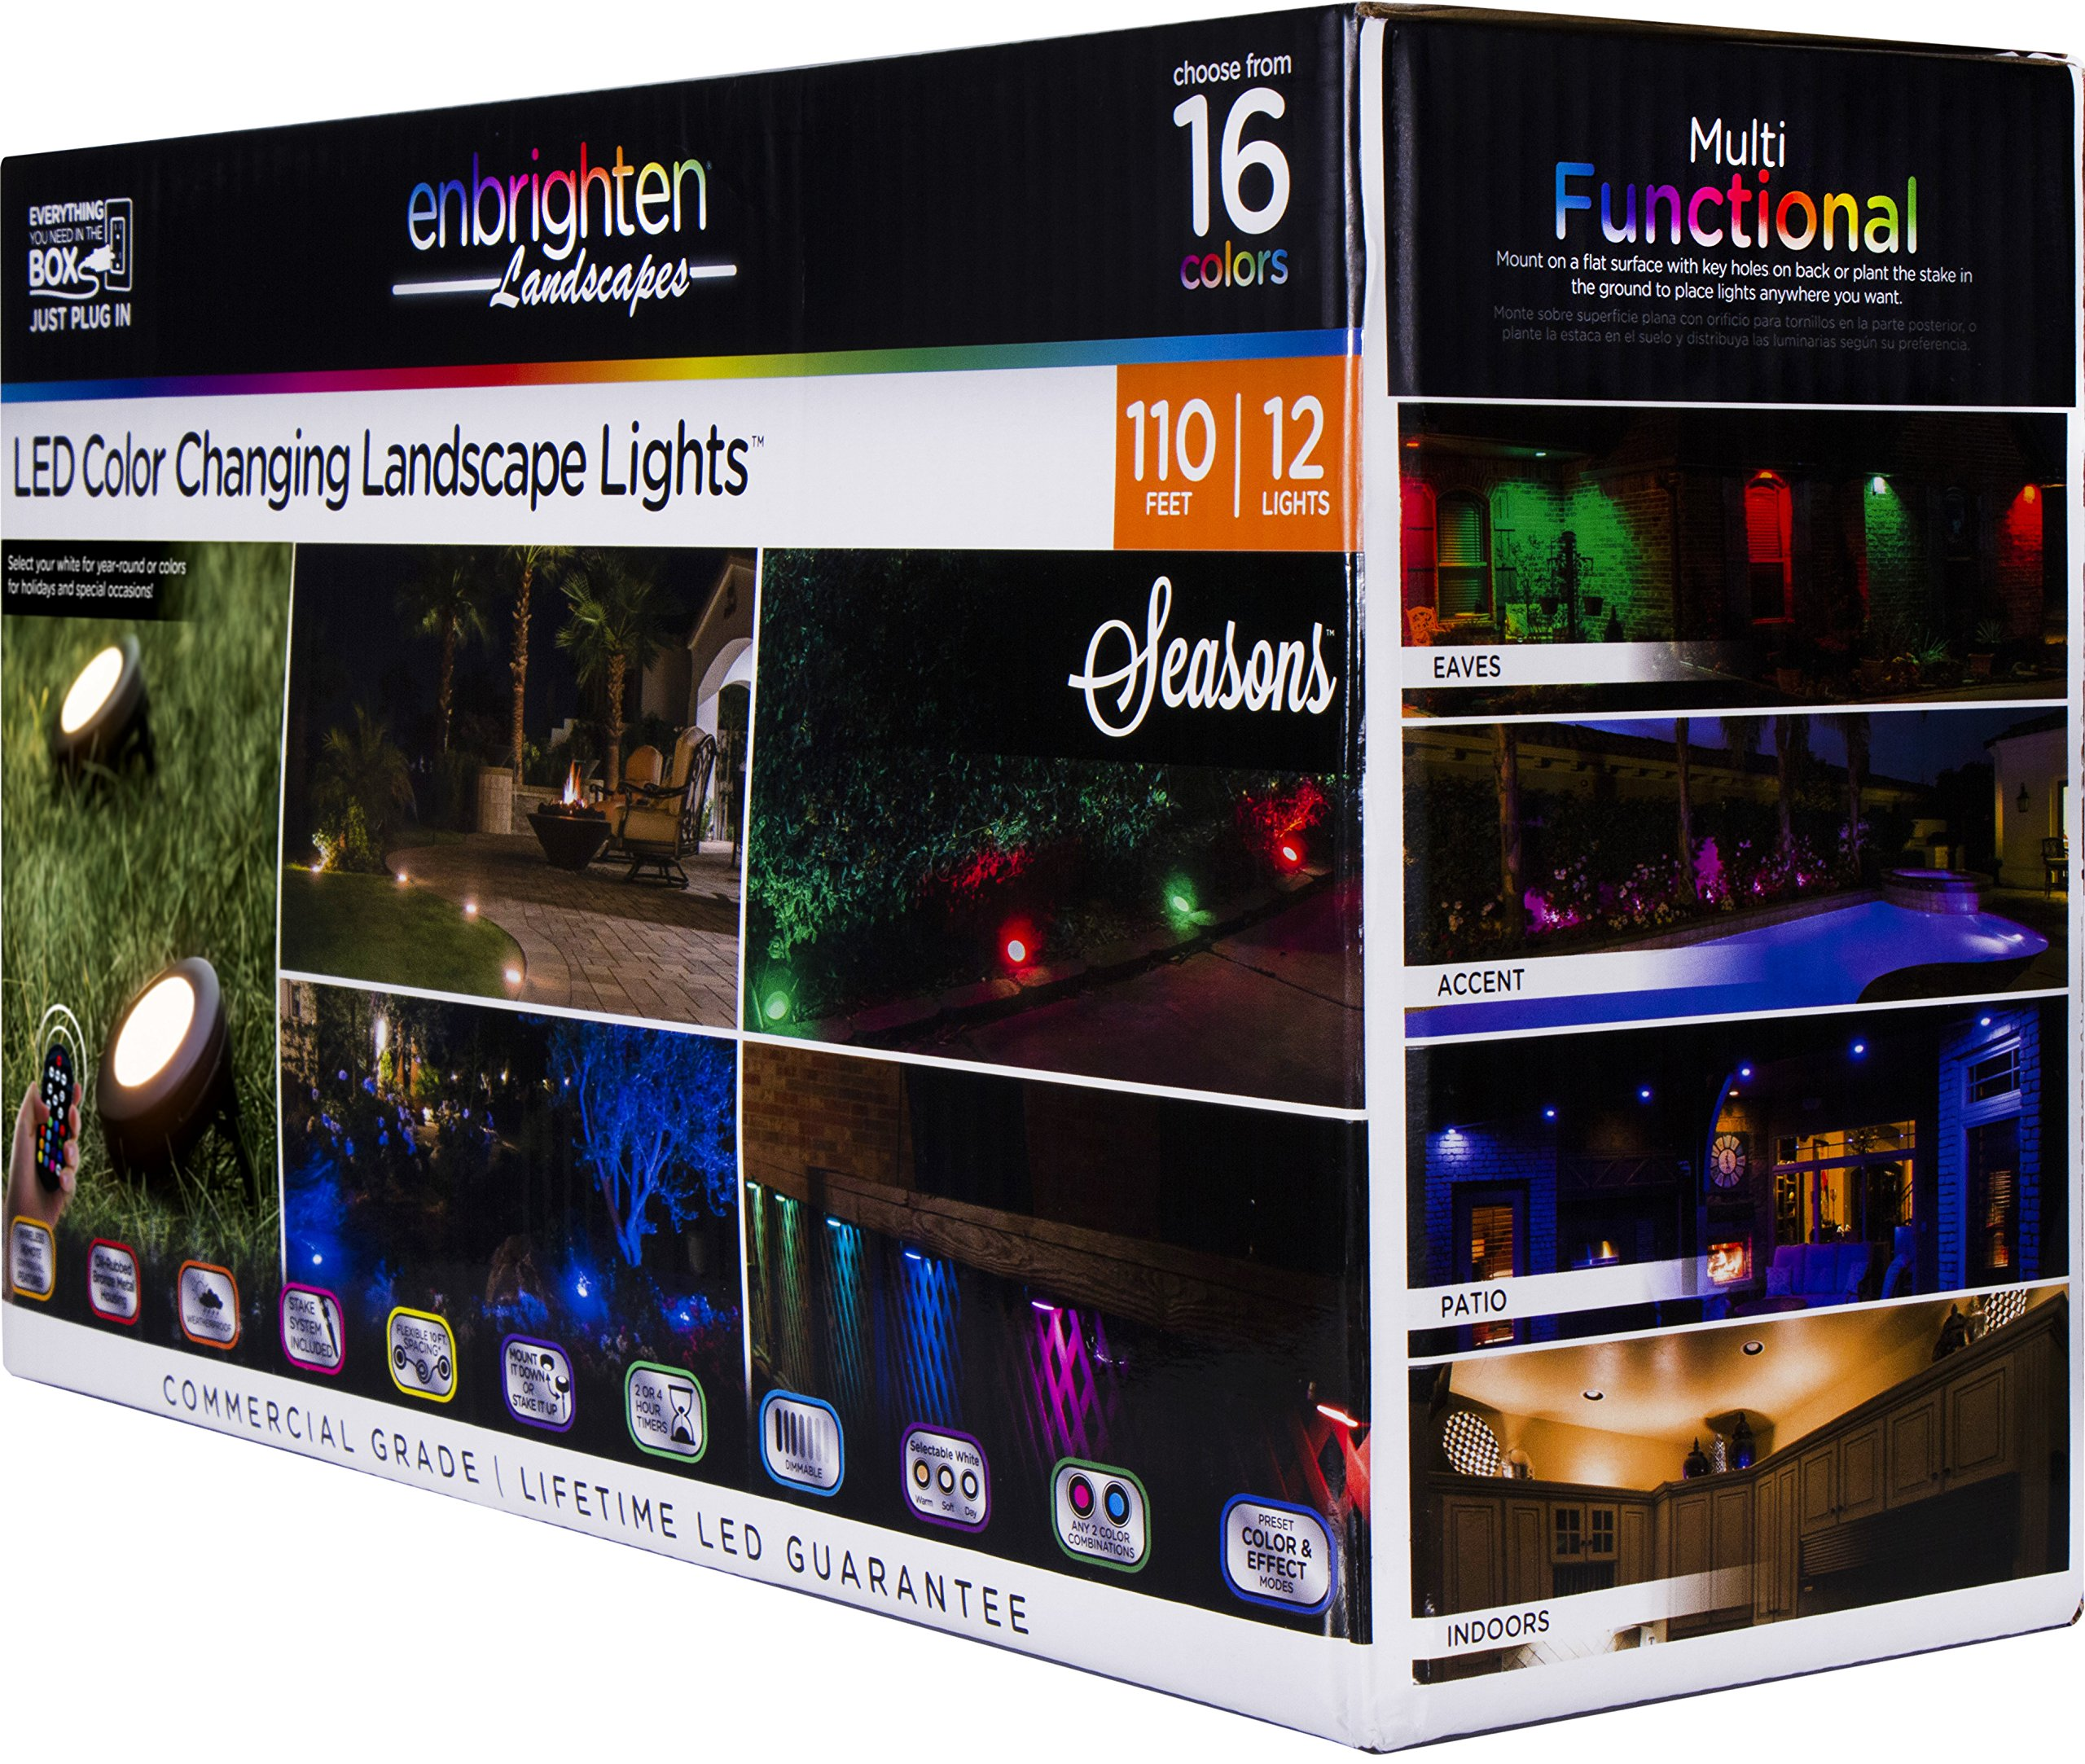 Enbrighten 41017 Seasons LED Landscape Lights (110ft.), Selectable White & Color Changing, 12 Lifetime Pucks, Wireless Remote, Outdoor, Commercial Grade, Weatherproof, Spotlight, Garden, Path Light by Enbrighten (Image #1)